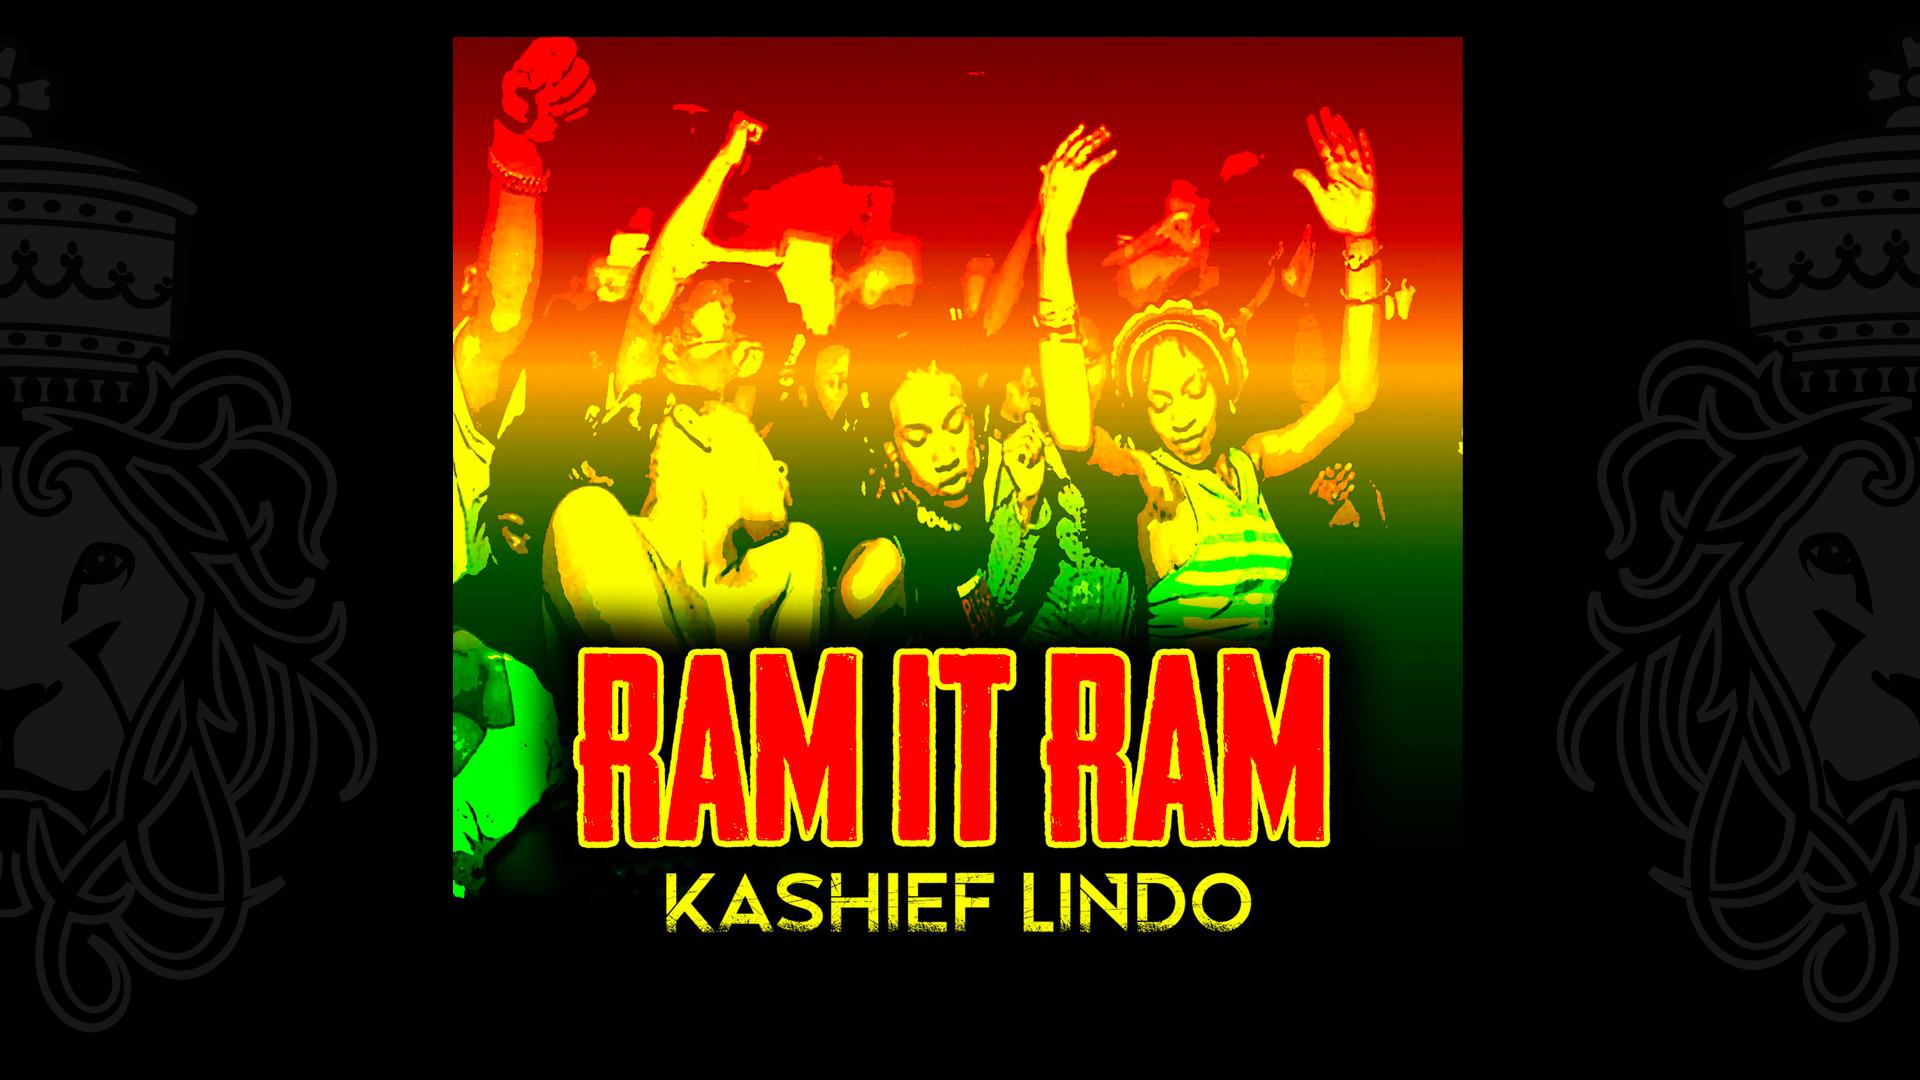 Ram it Ram - Kashief Lindo